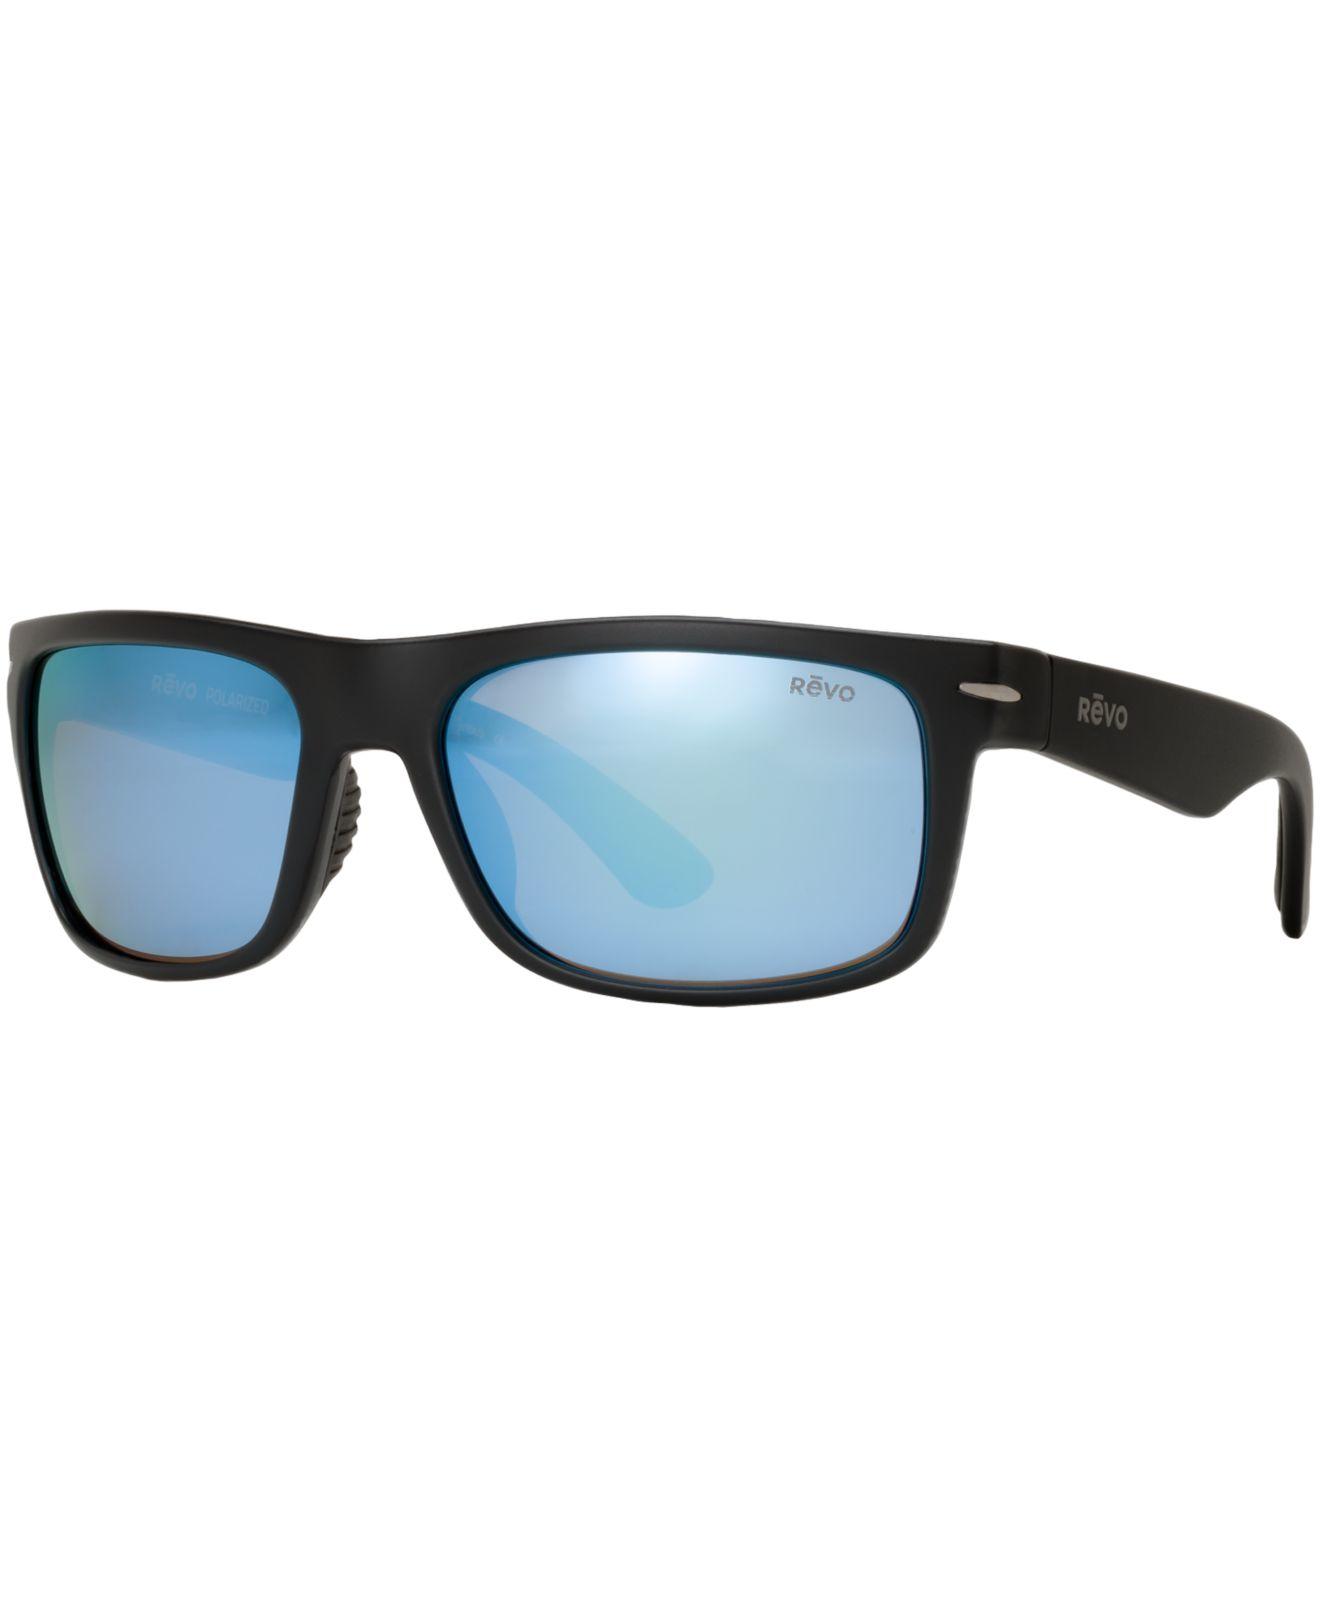 4fc9881797 Lyst - Revo Re5005x Vanguard in Black for Men